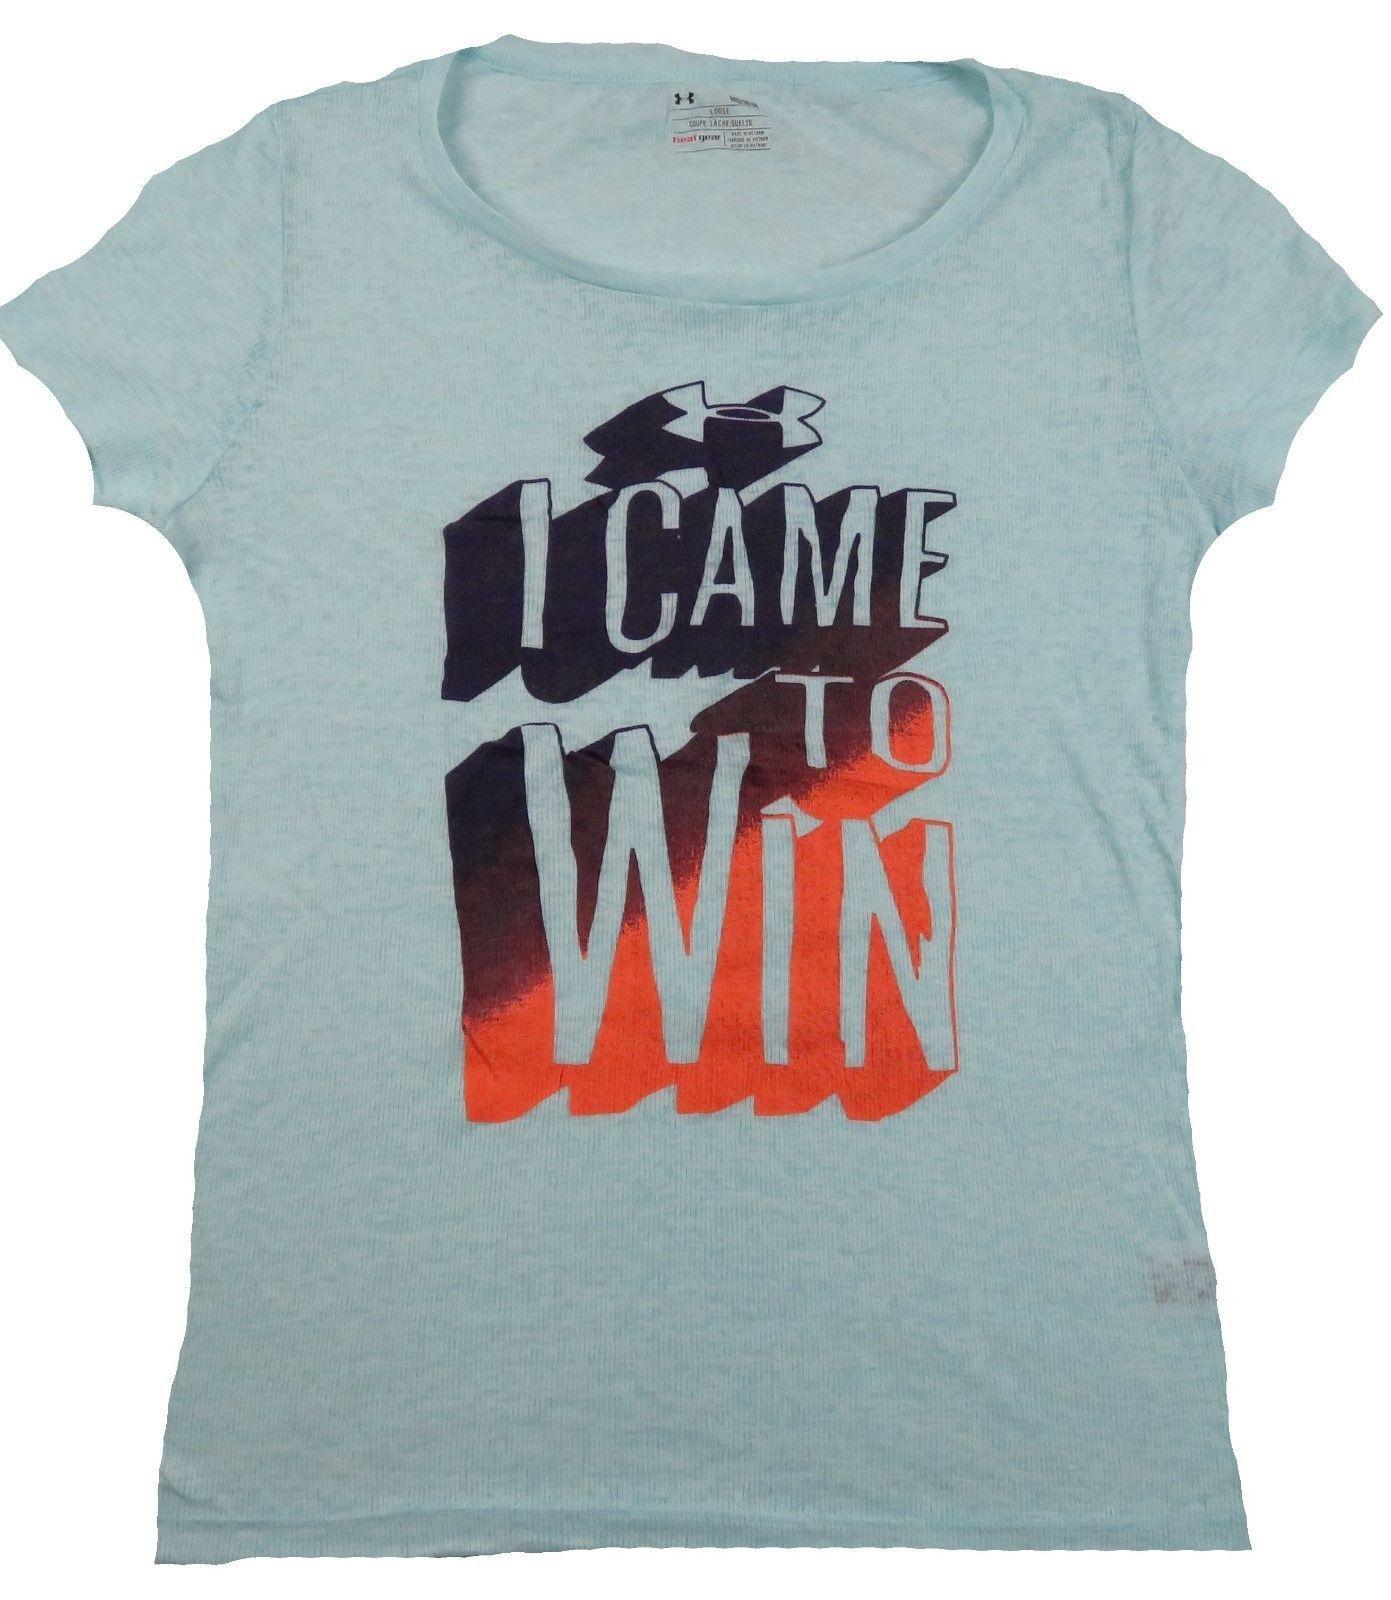 Women's Under Armour Shirt Loose Heat Gear Tee Blue Slub I Came To Win NEW